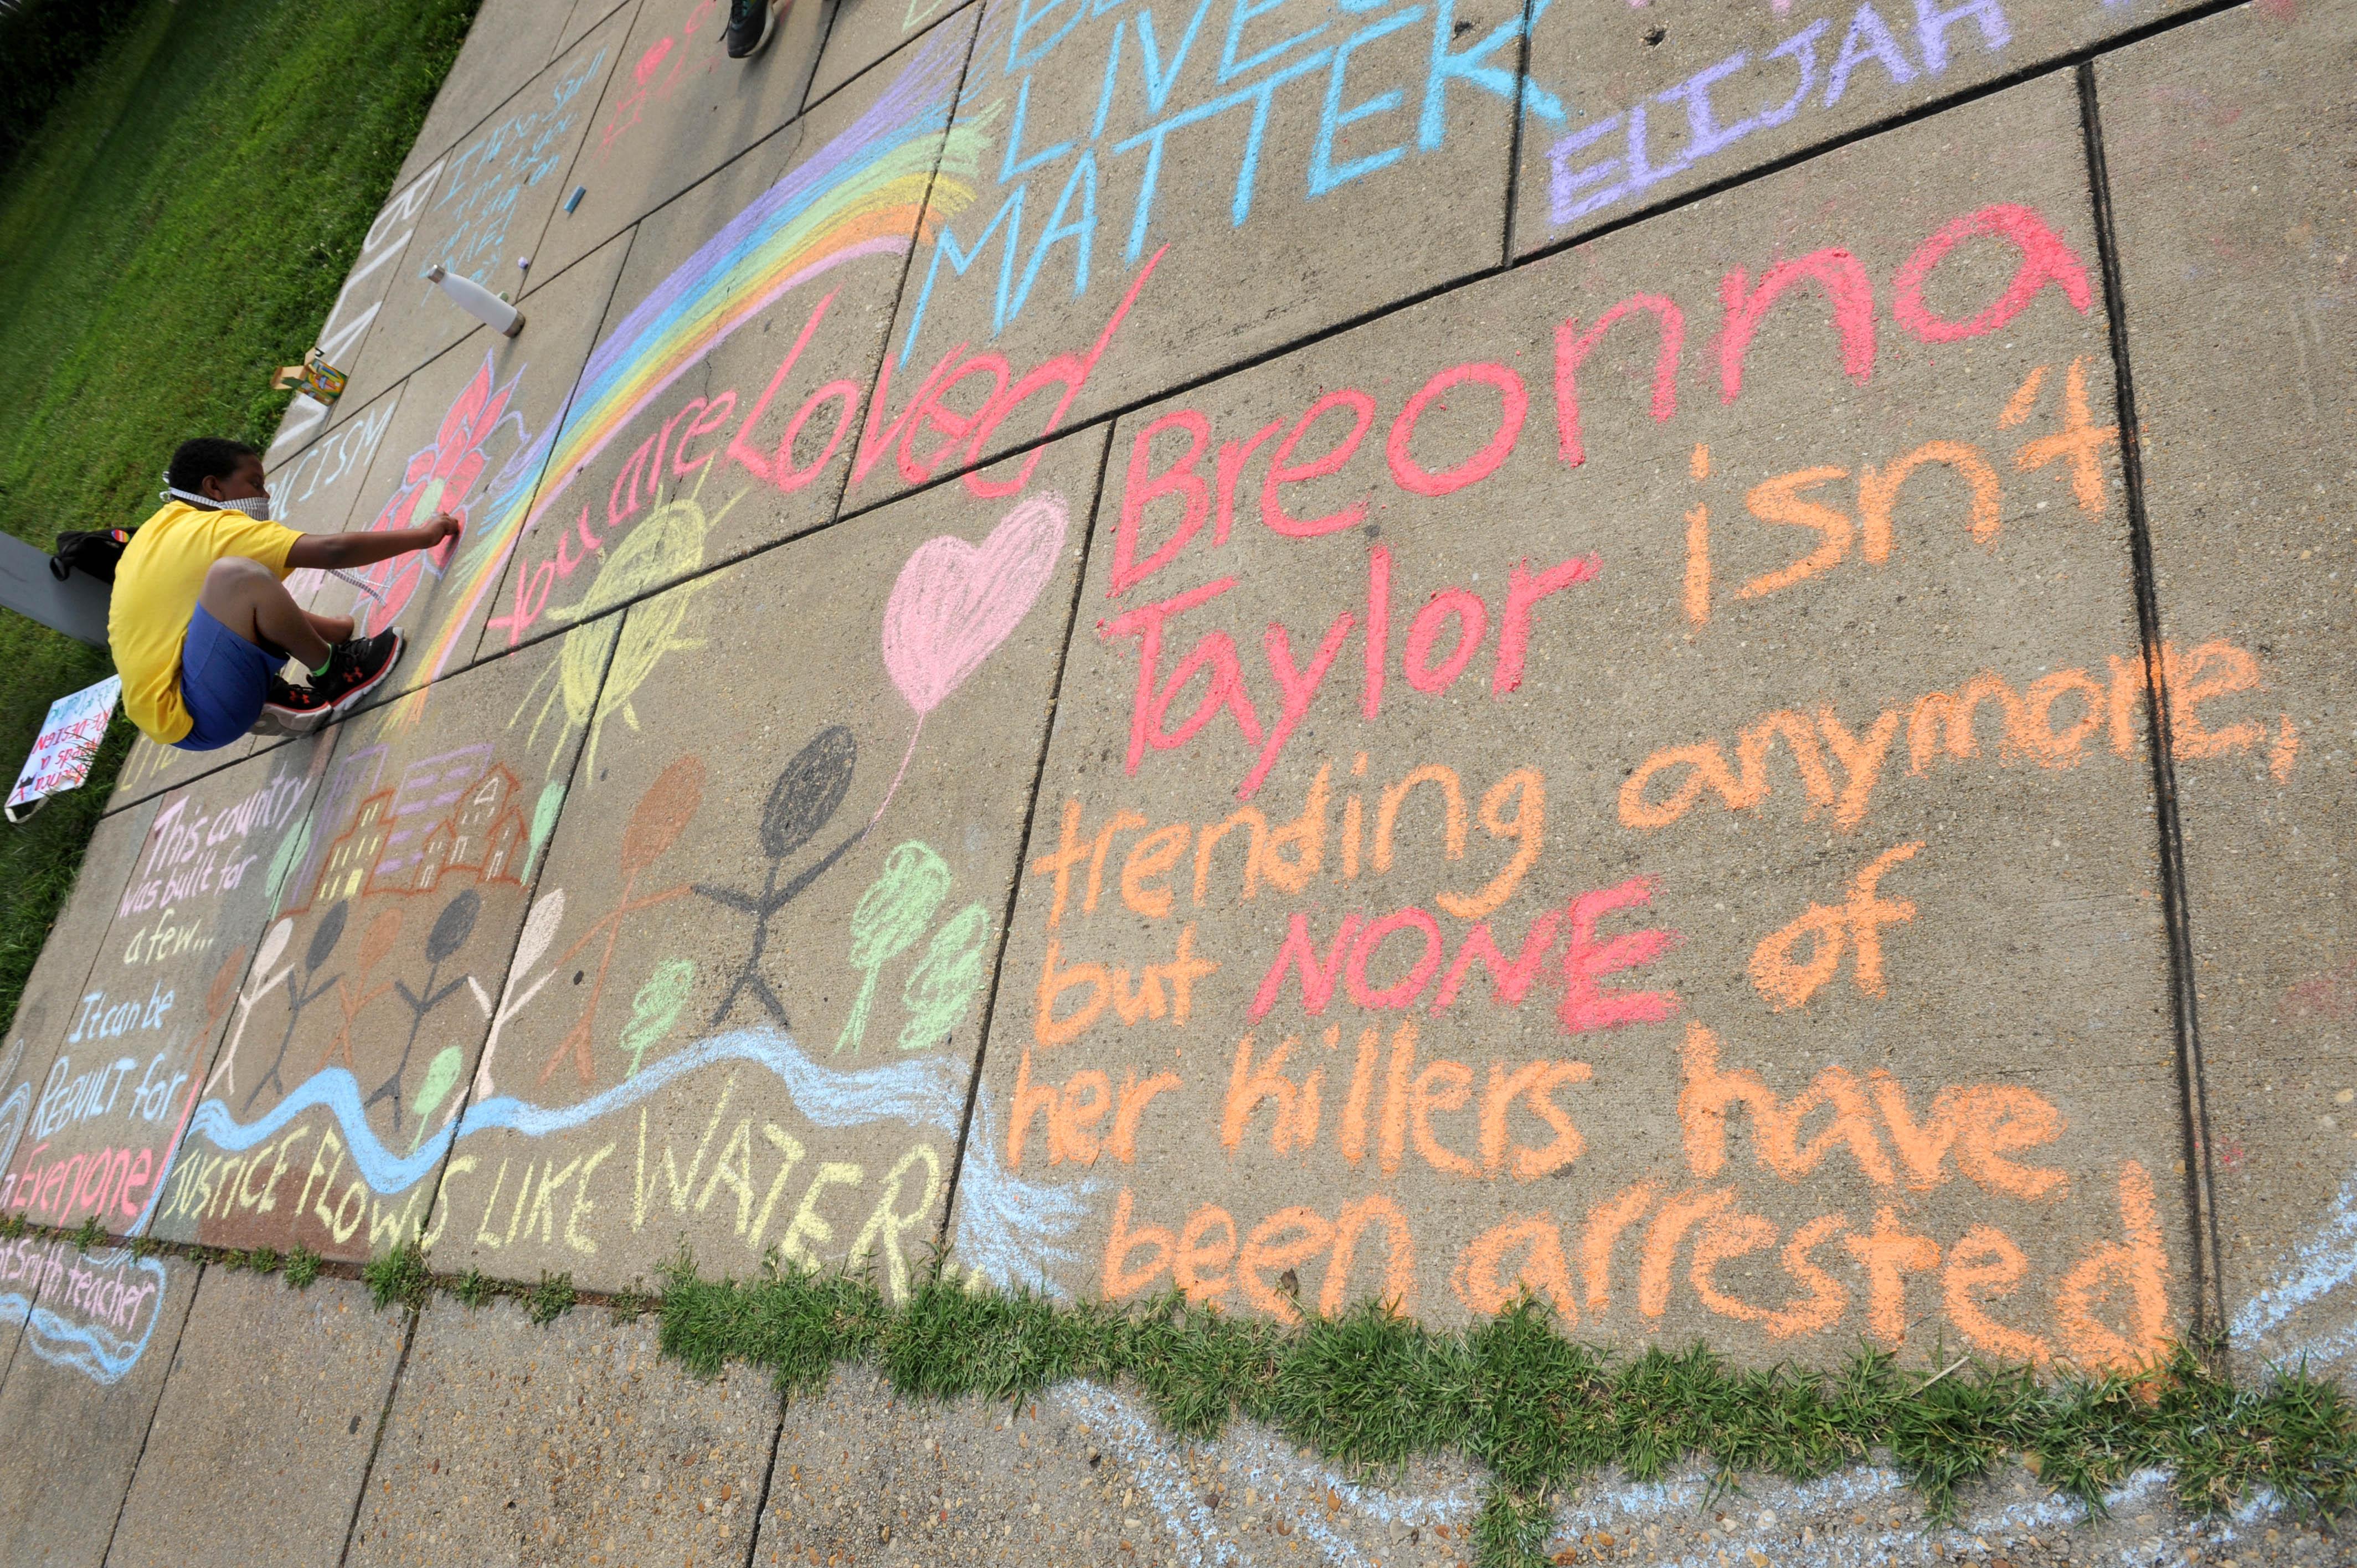 Quarantine Diary 25Vigil for Black Lives Matter on 16th Street NW, at tWashington Ethical Society-7750 16th St NW, Washington, DC 20012With FabrangenShofar blowers are: Judy Galat, Richard Gladstein. Lucy Steinitz, Fran Teplowitz